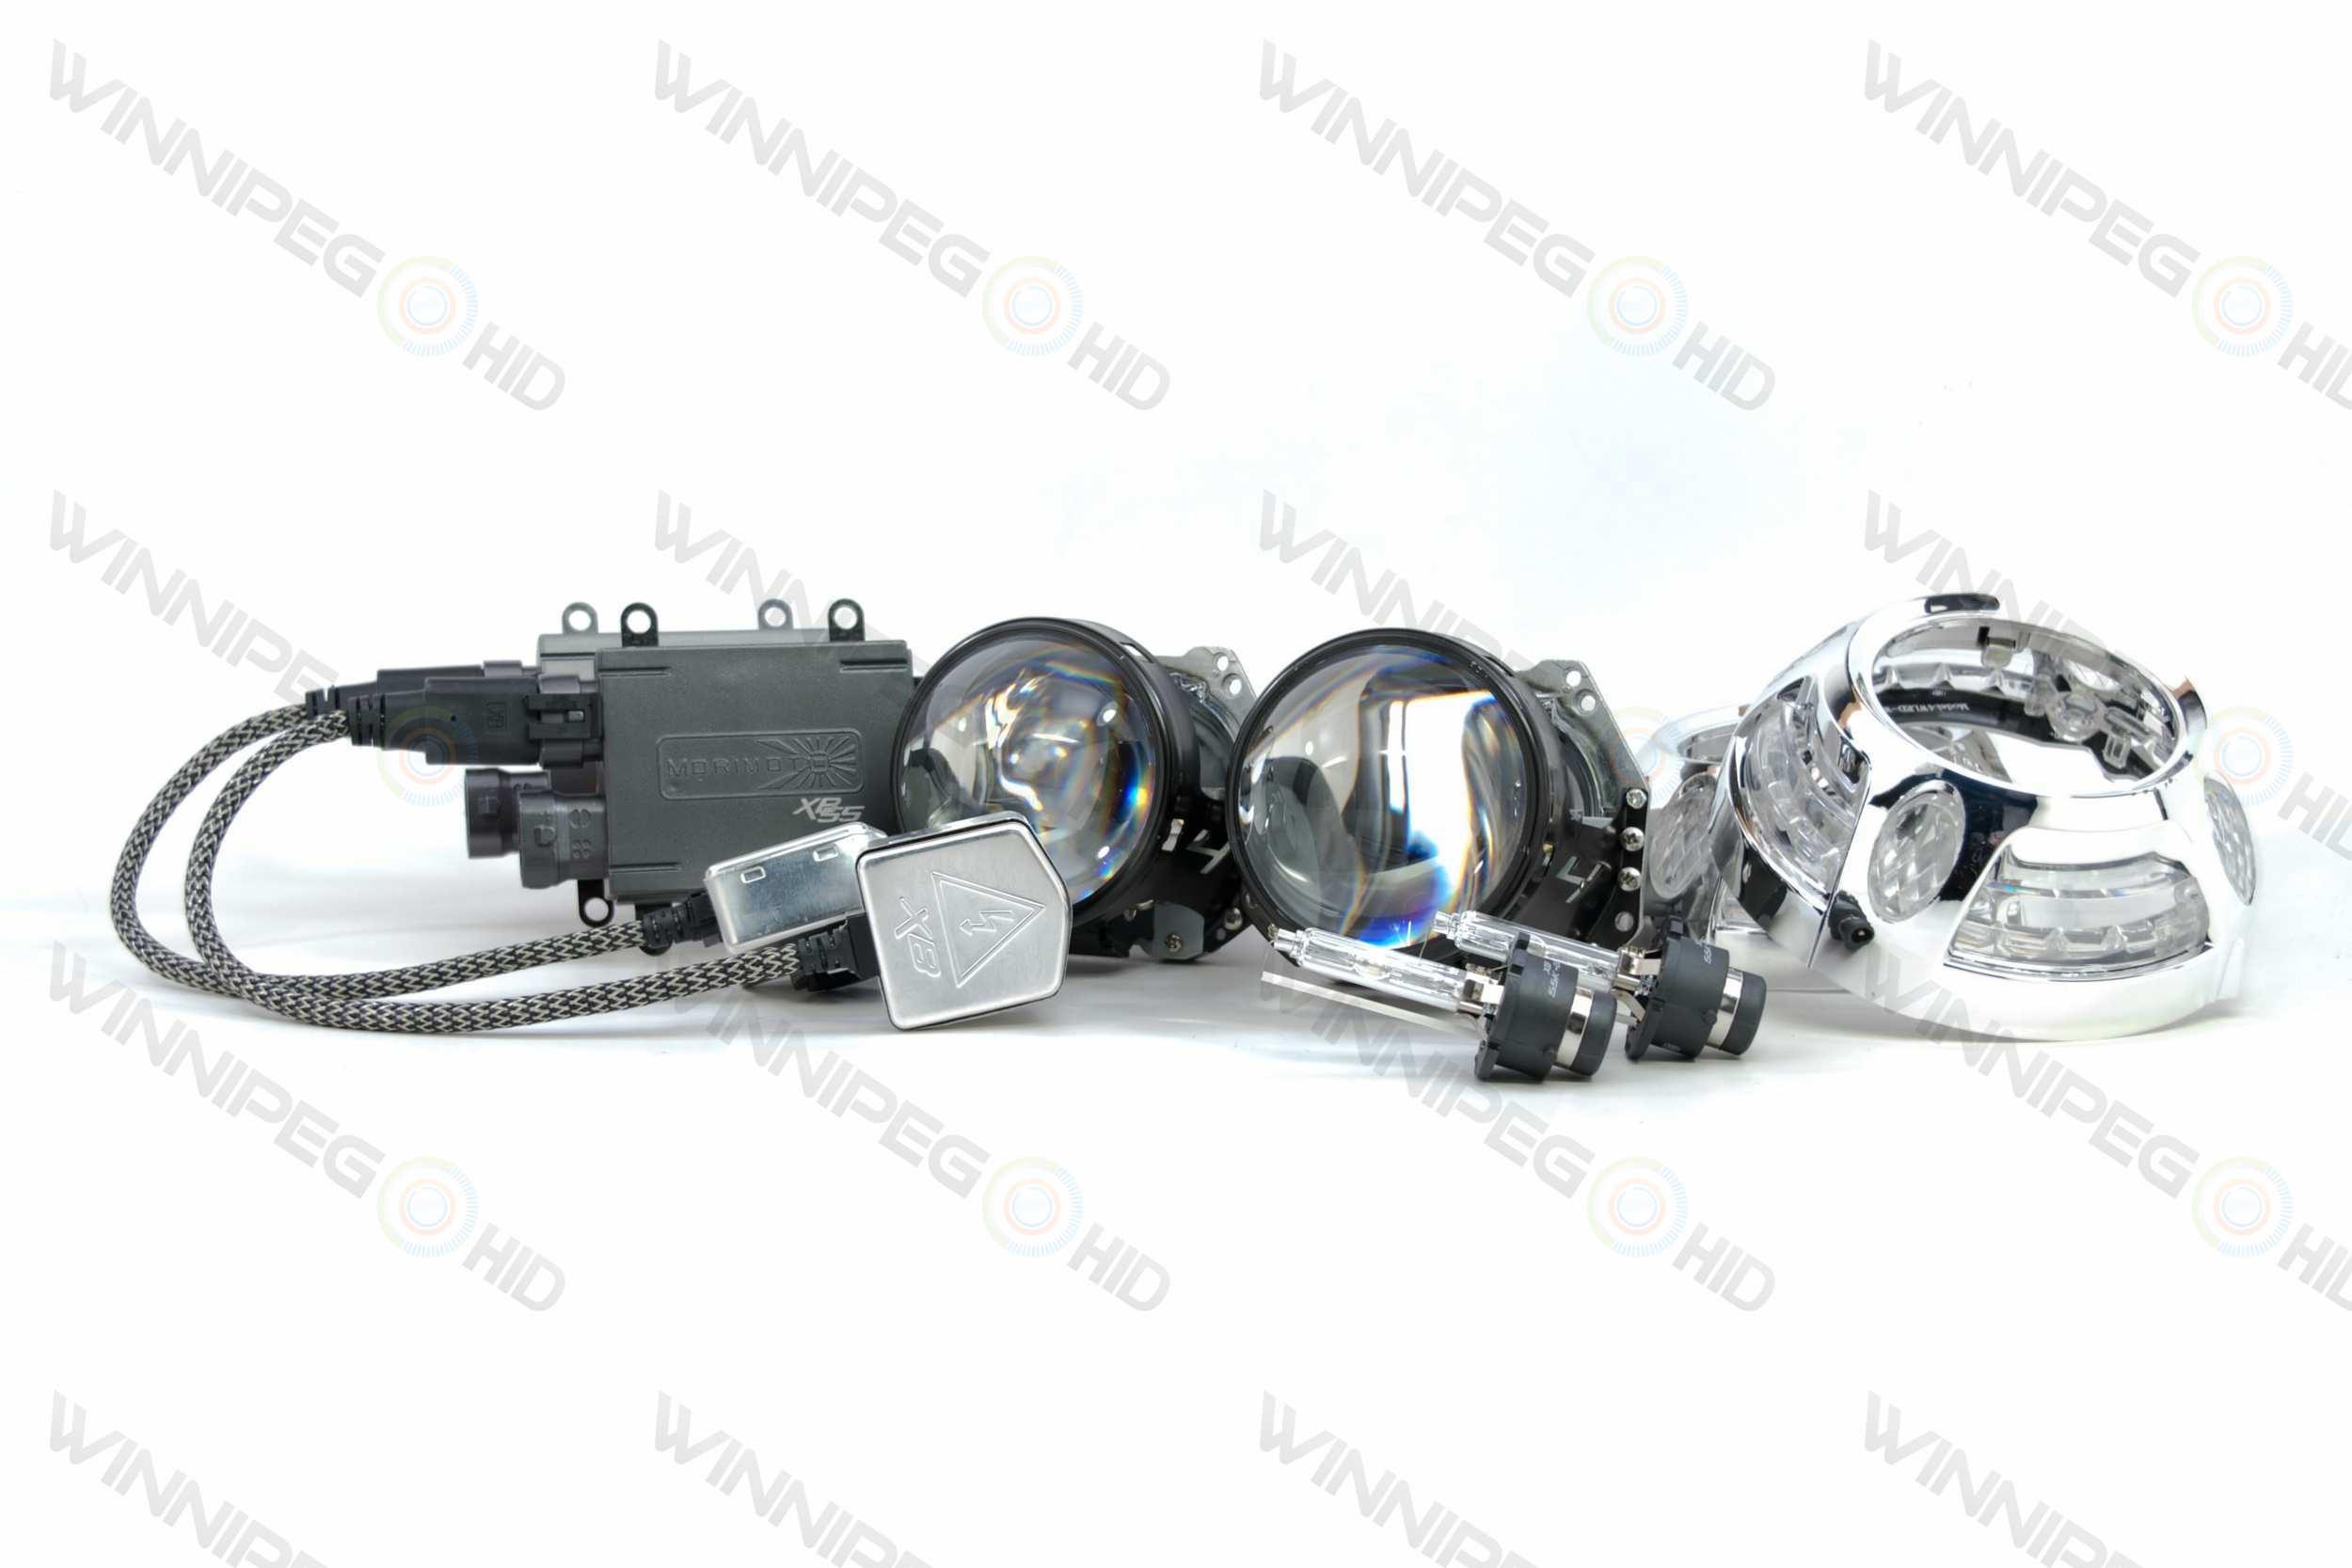 Bi Xenon Morimoto Mini D S Stage Iii Headlight Retrofit Kit on Hid Relay Harness Install